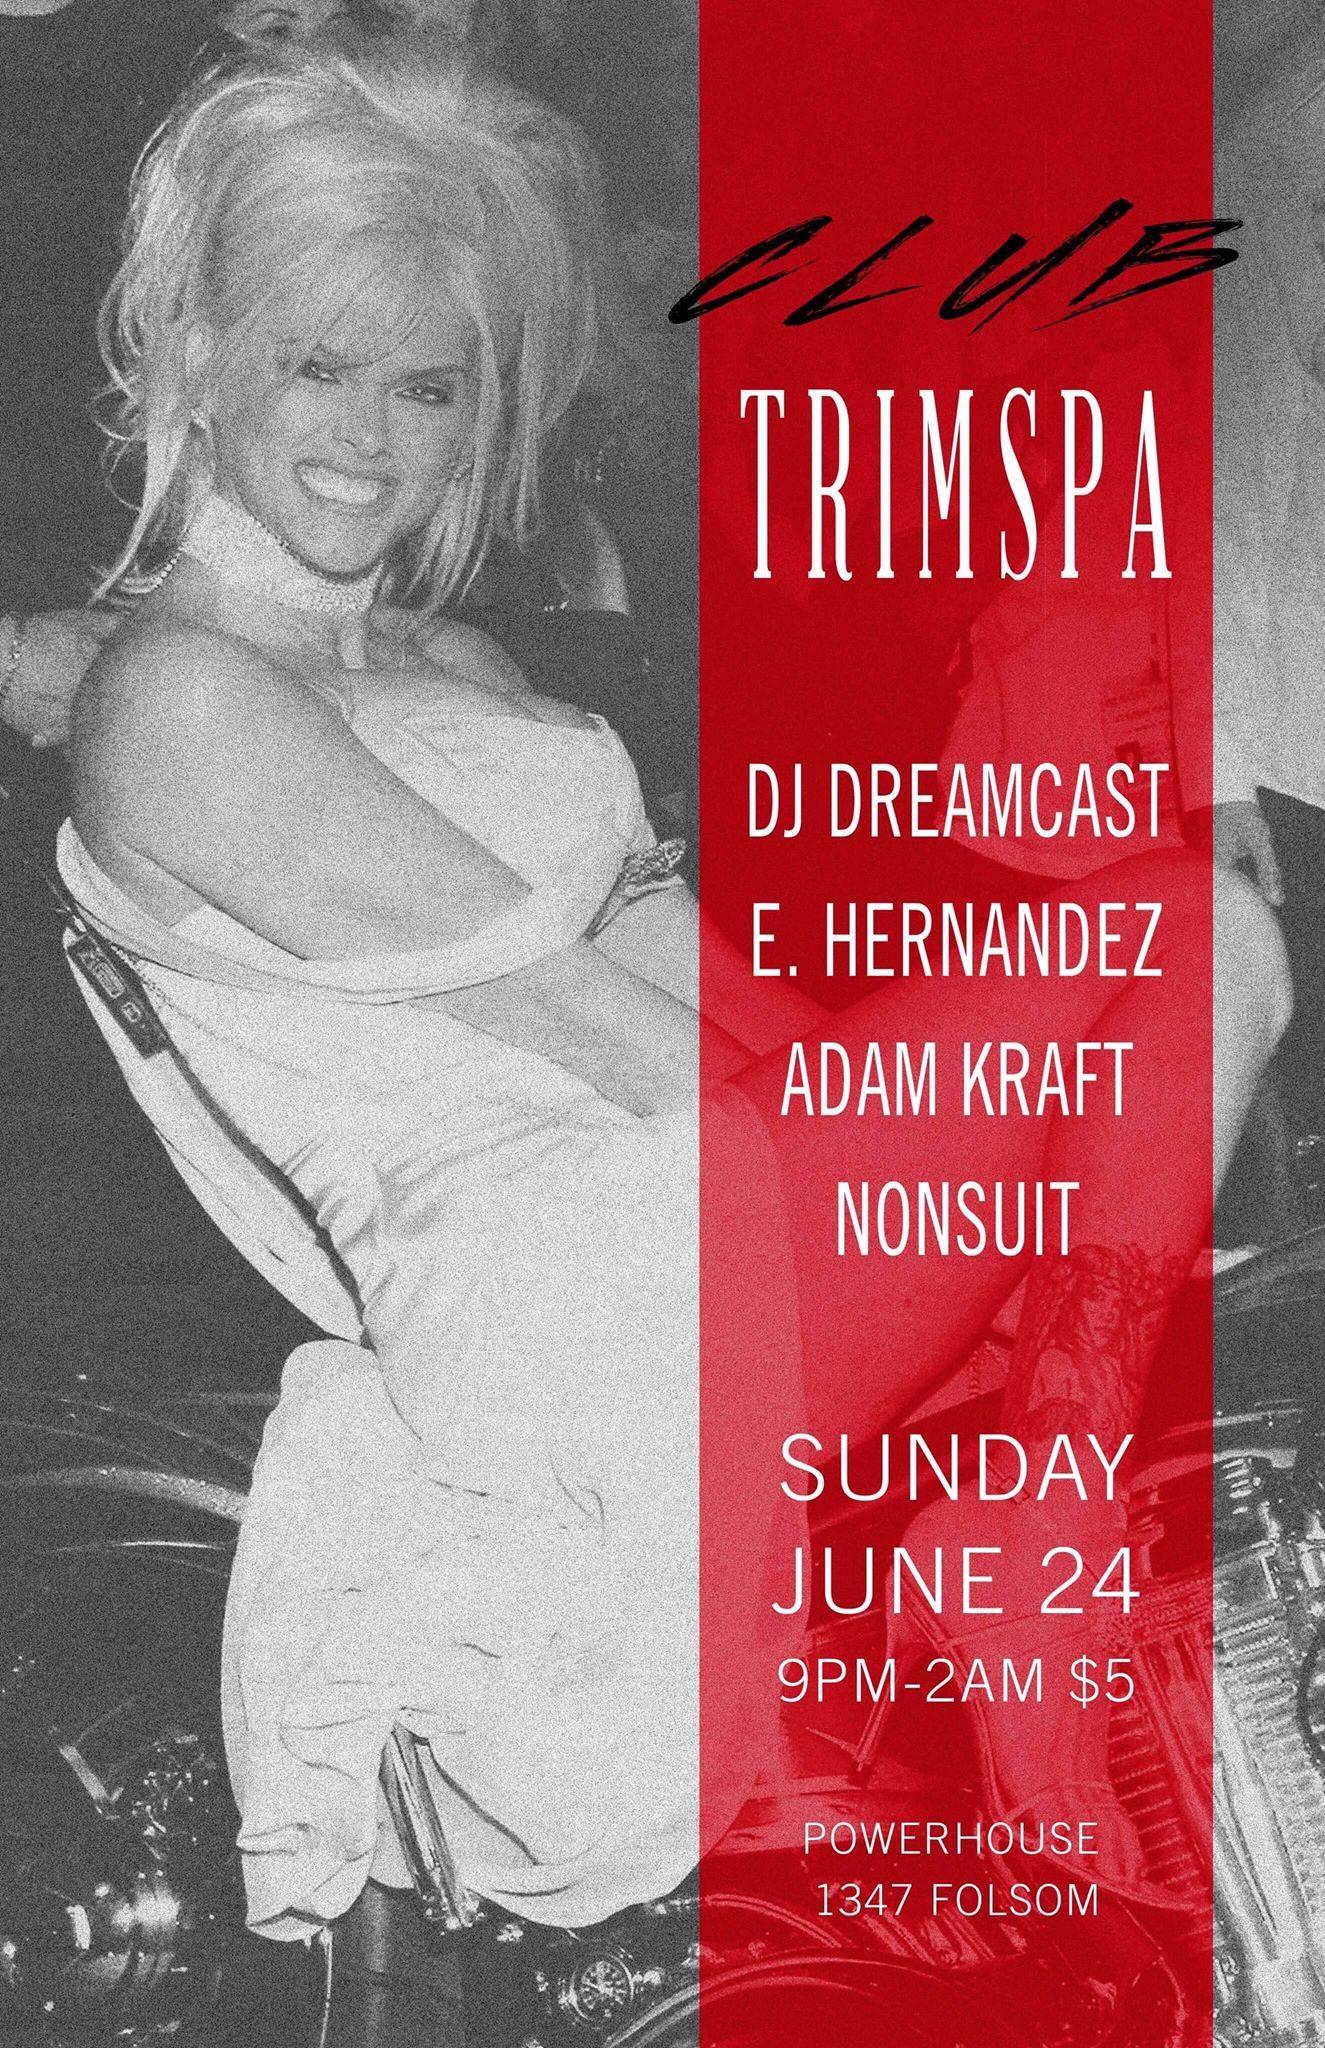 Club Trimspa